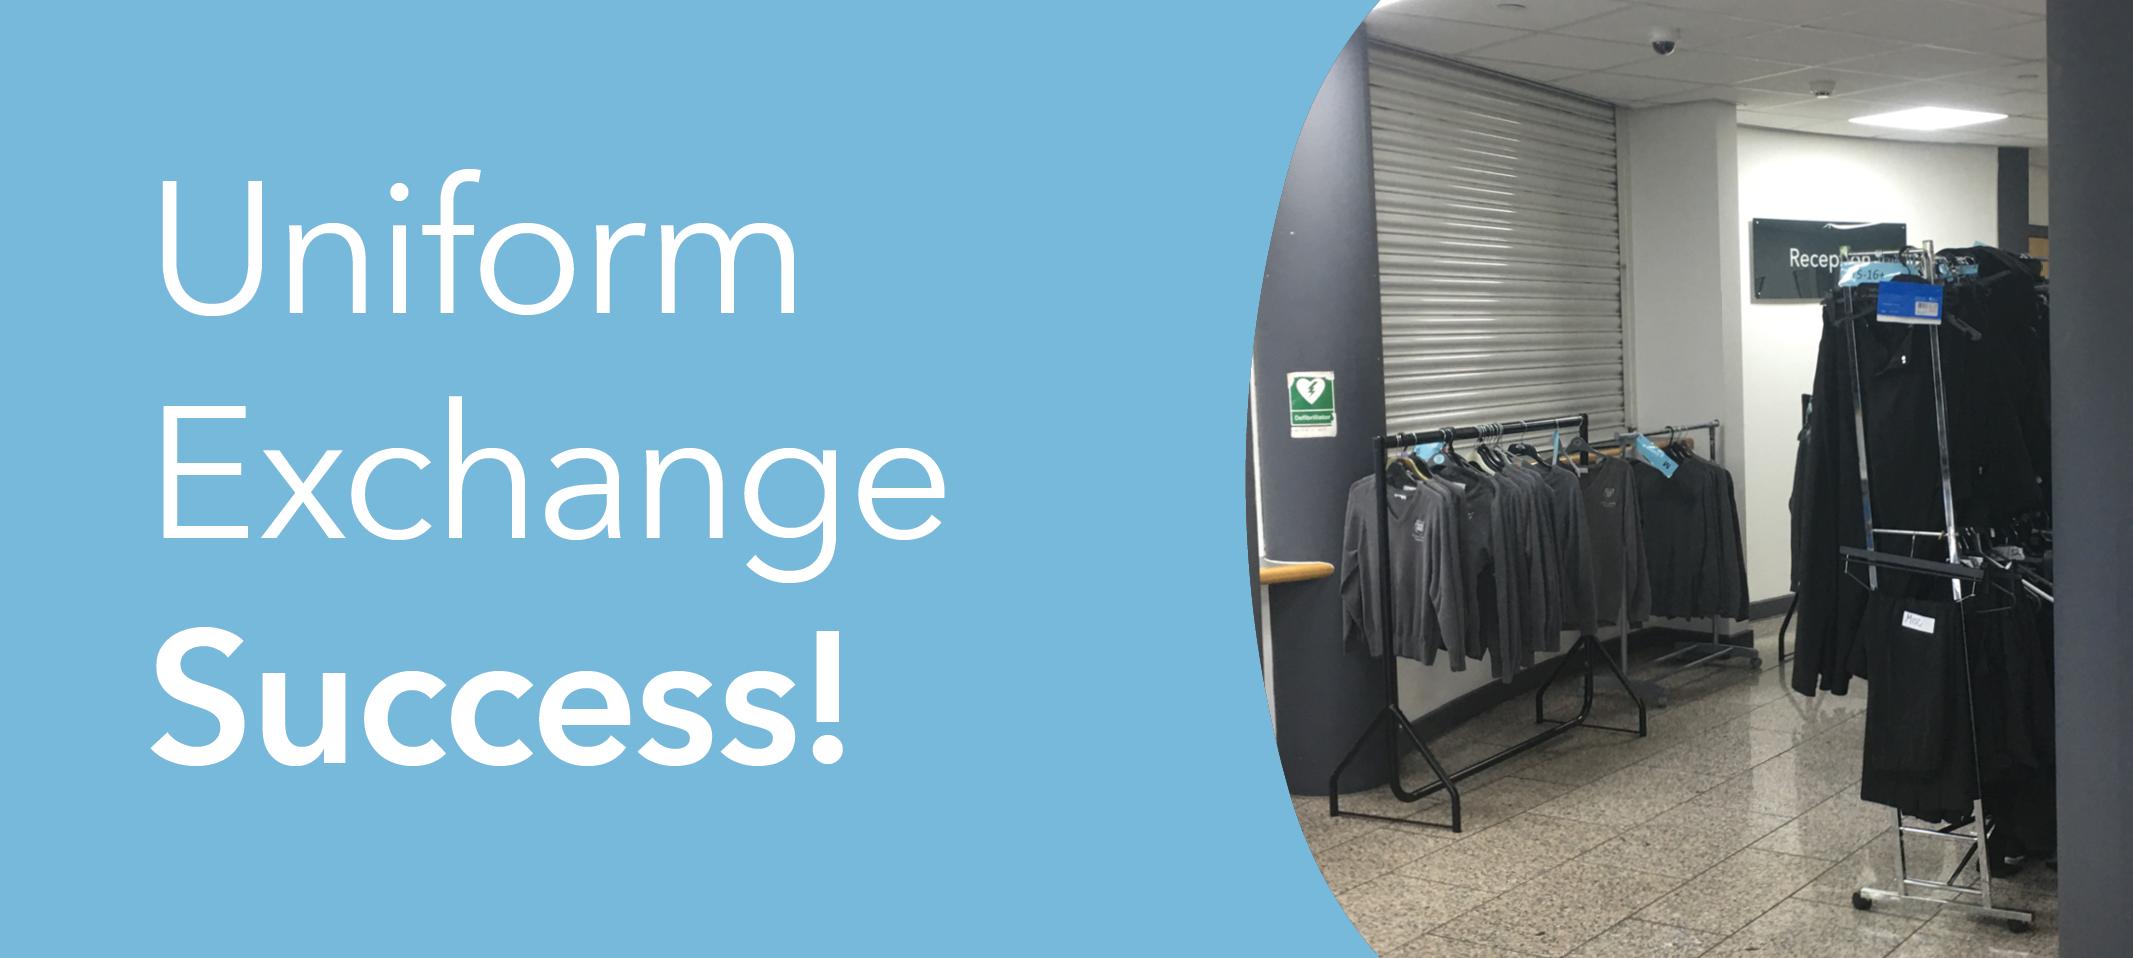 Uniform exchange success thanks to community spirit!